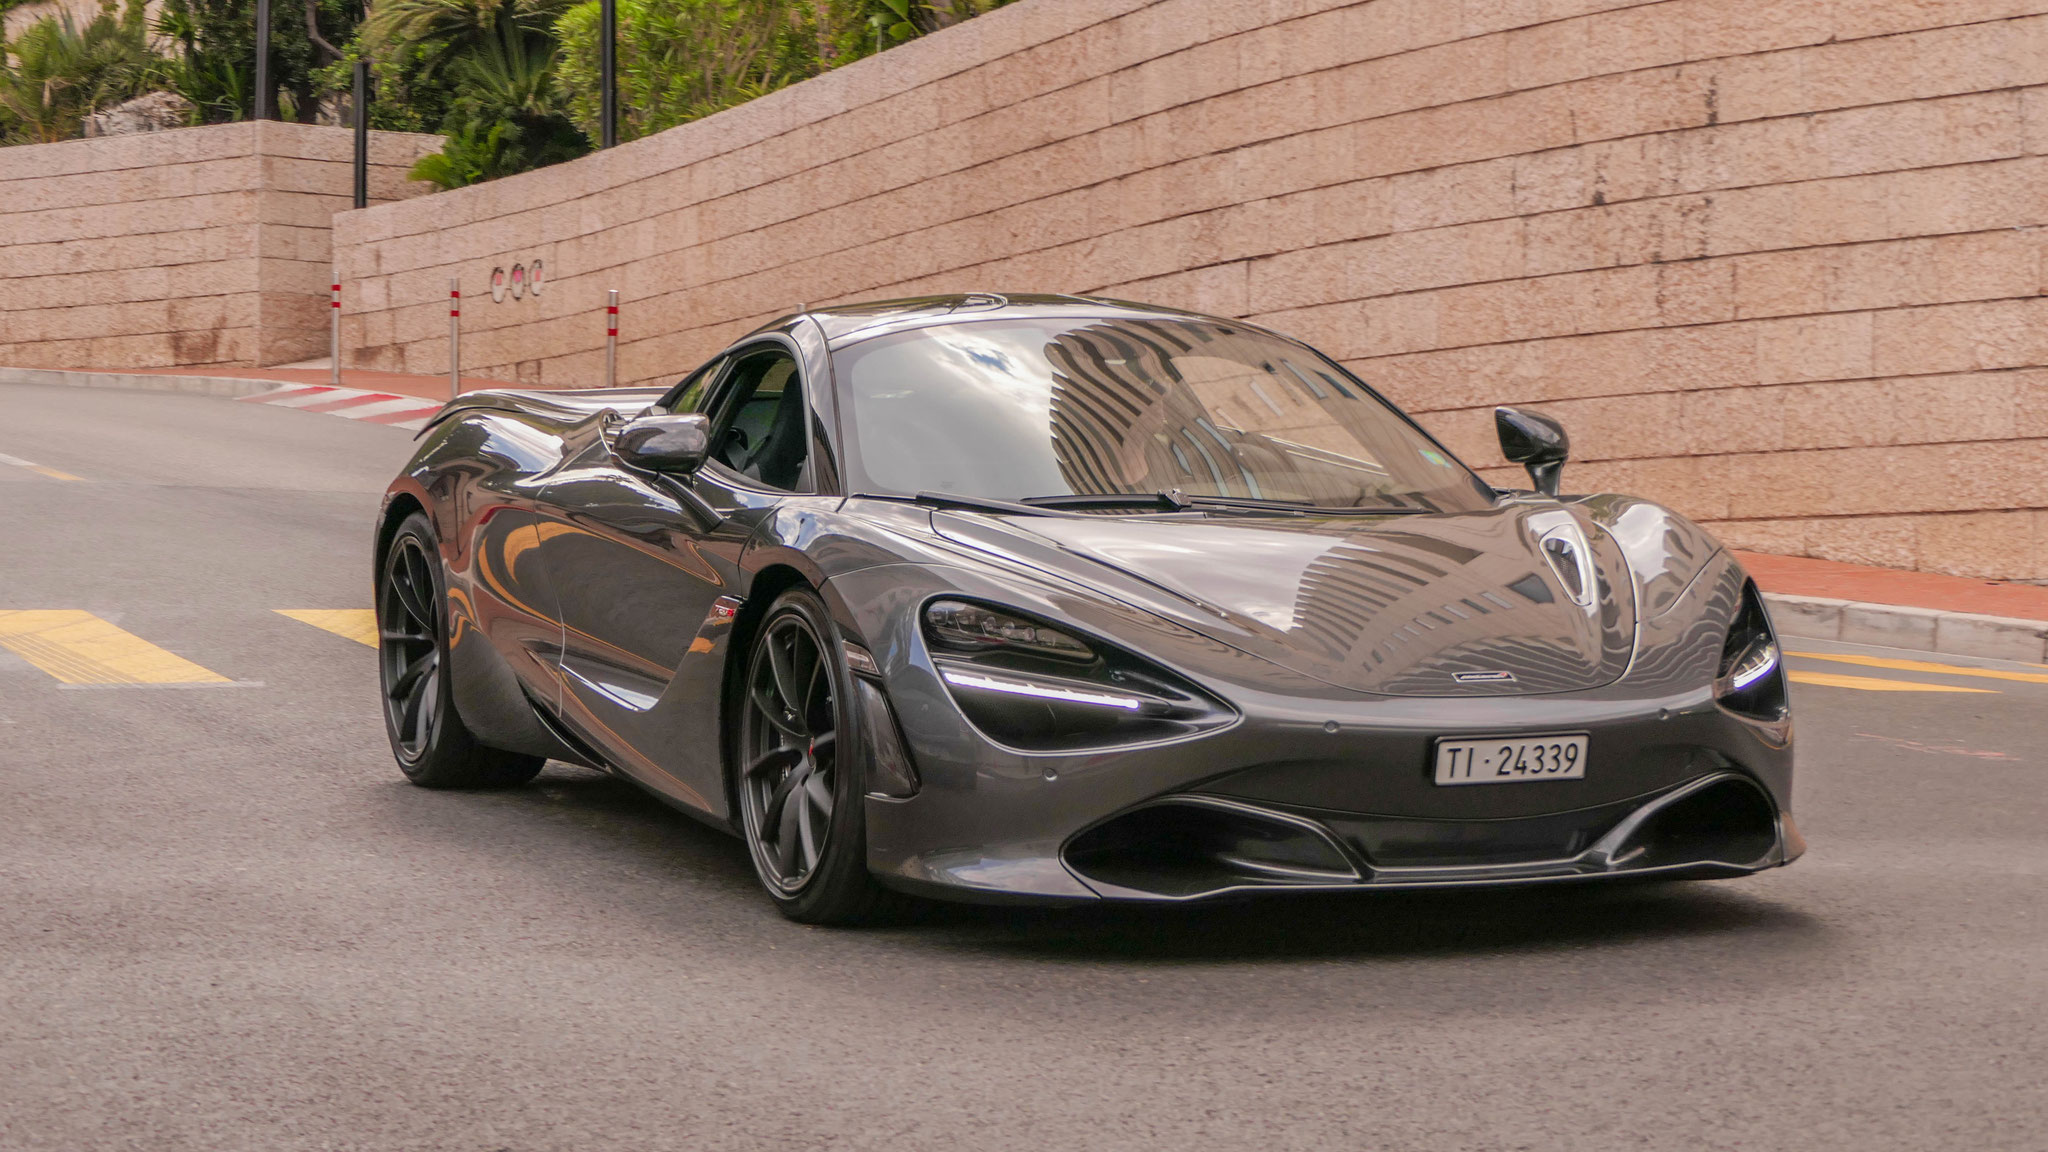 McLaren 720S - TI-24339 (CH)